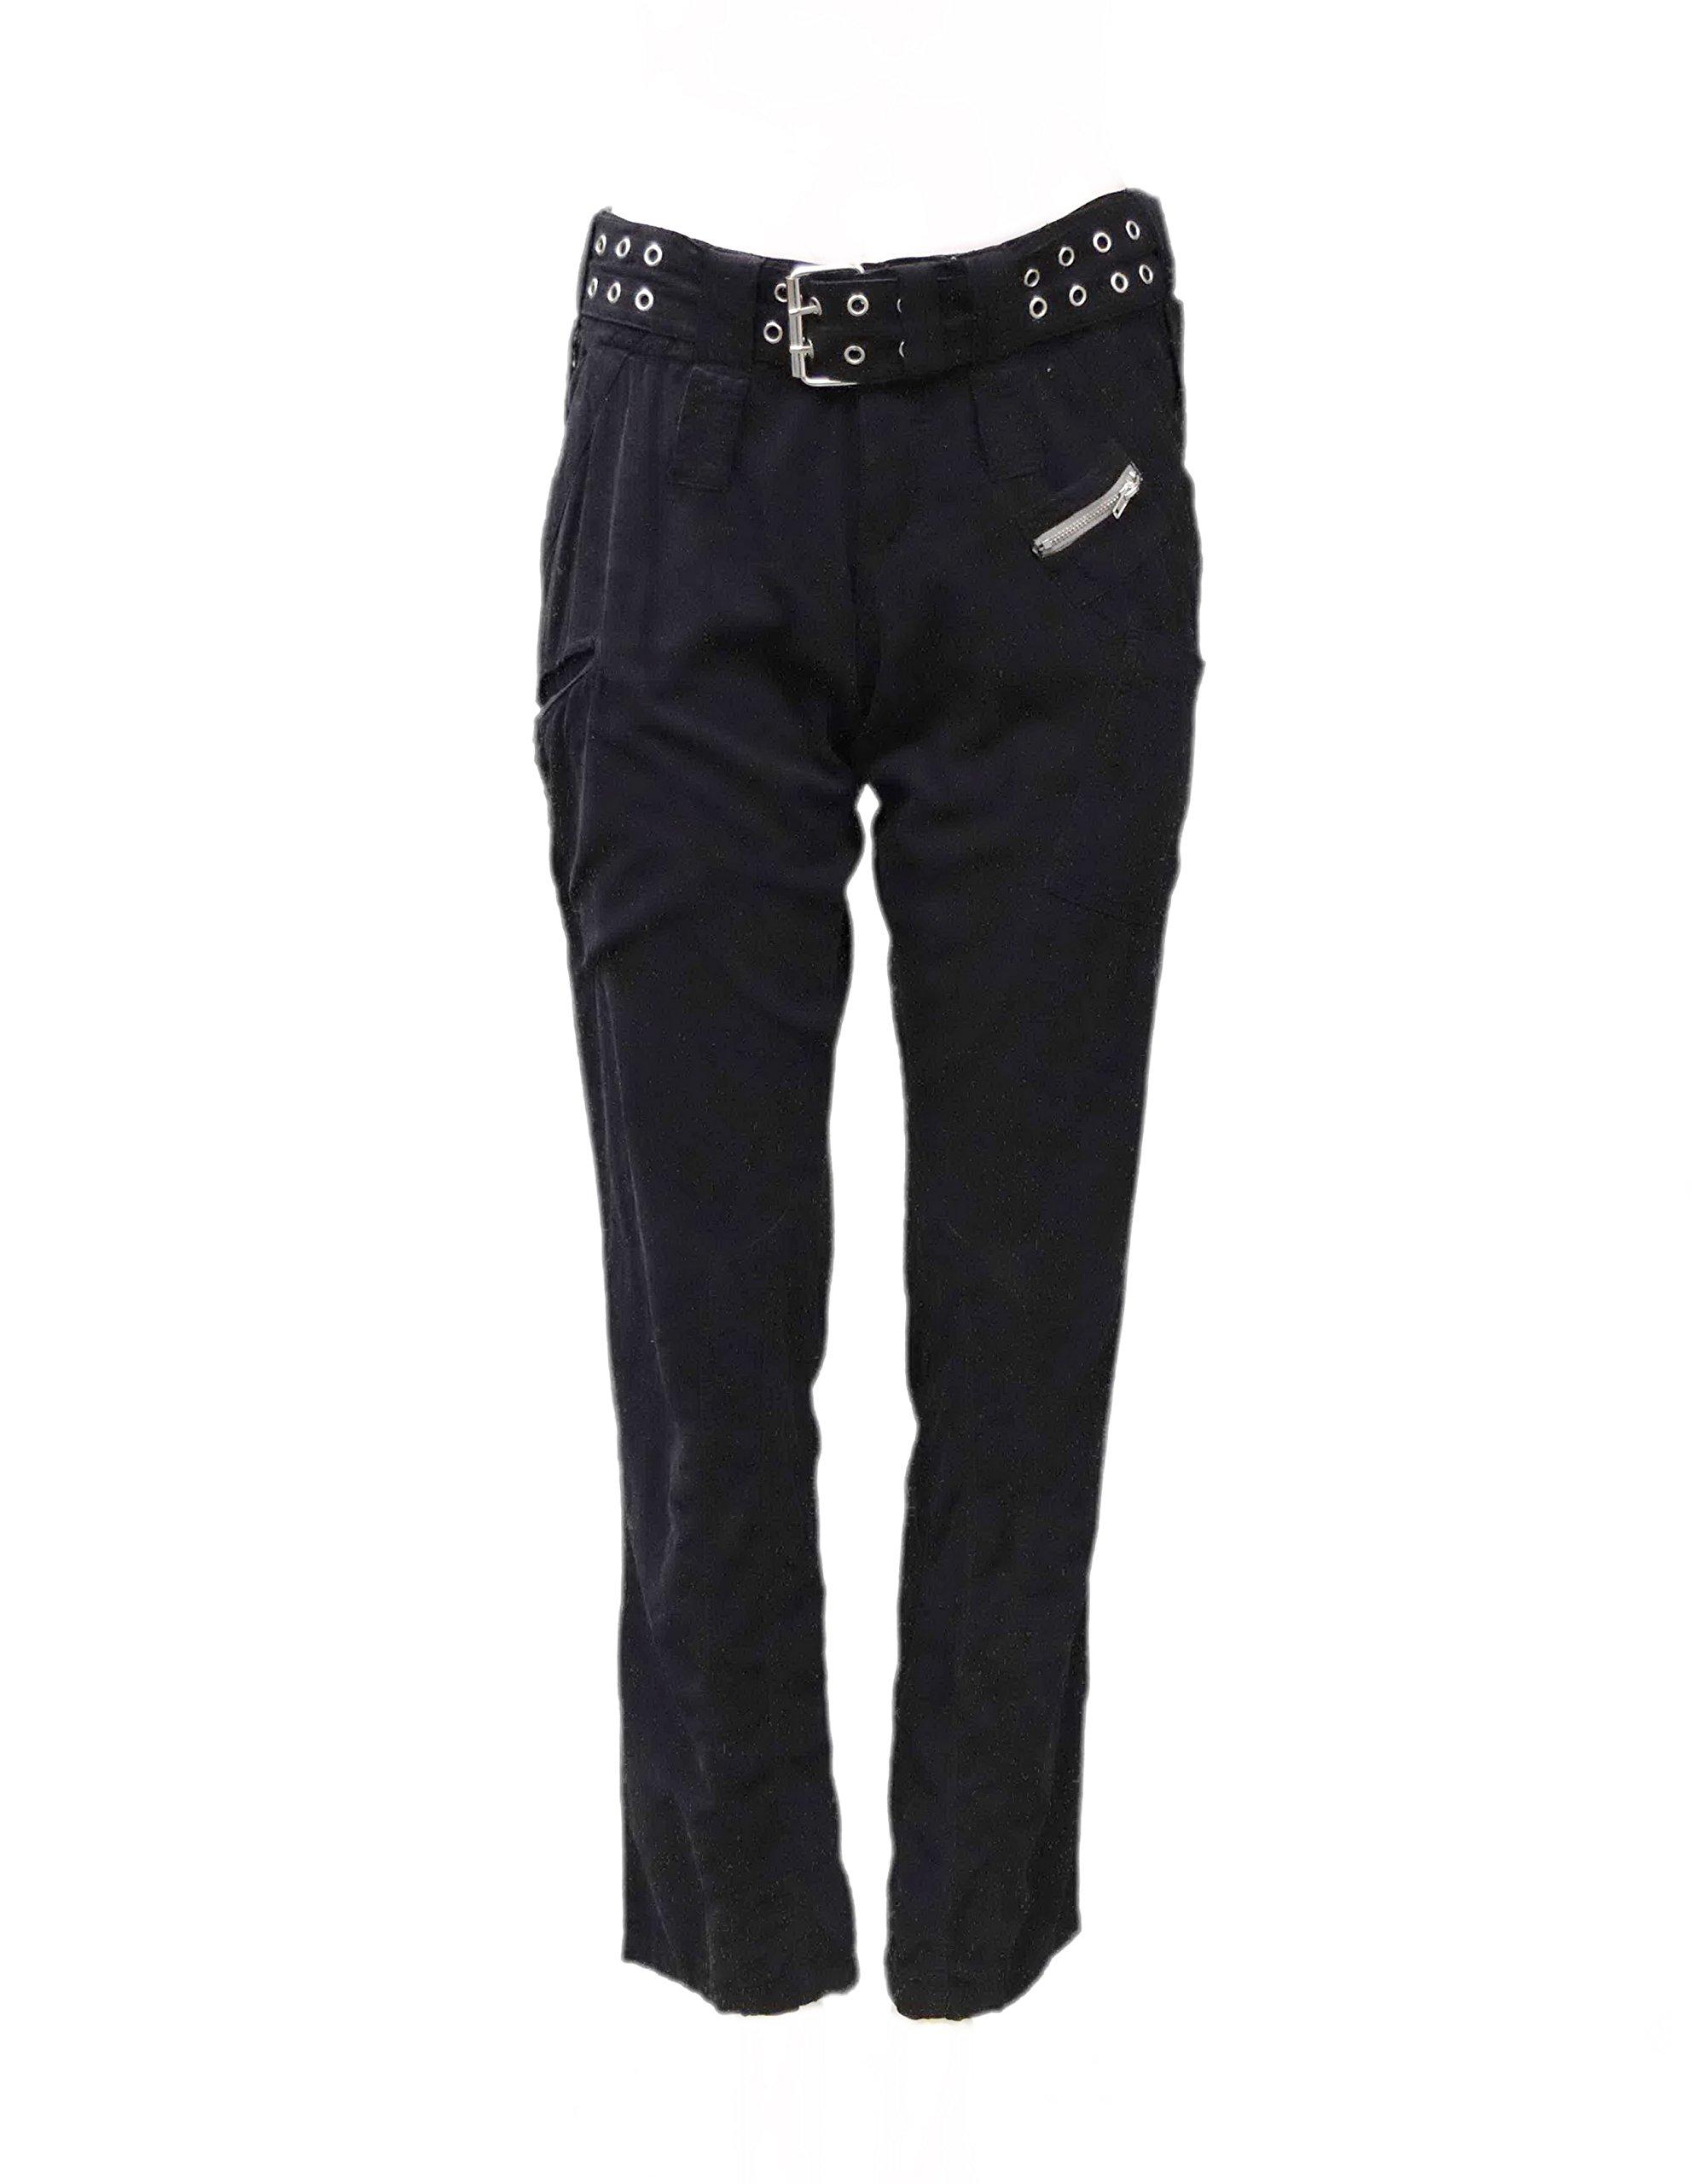 PETE & GRETTA Womens Soft Fine Corduroy Cargo Pocket Pants Sz 0 Black 100778E